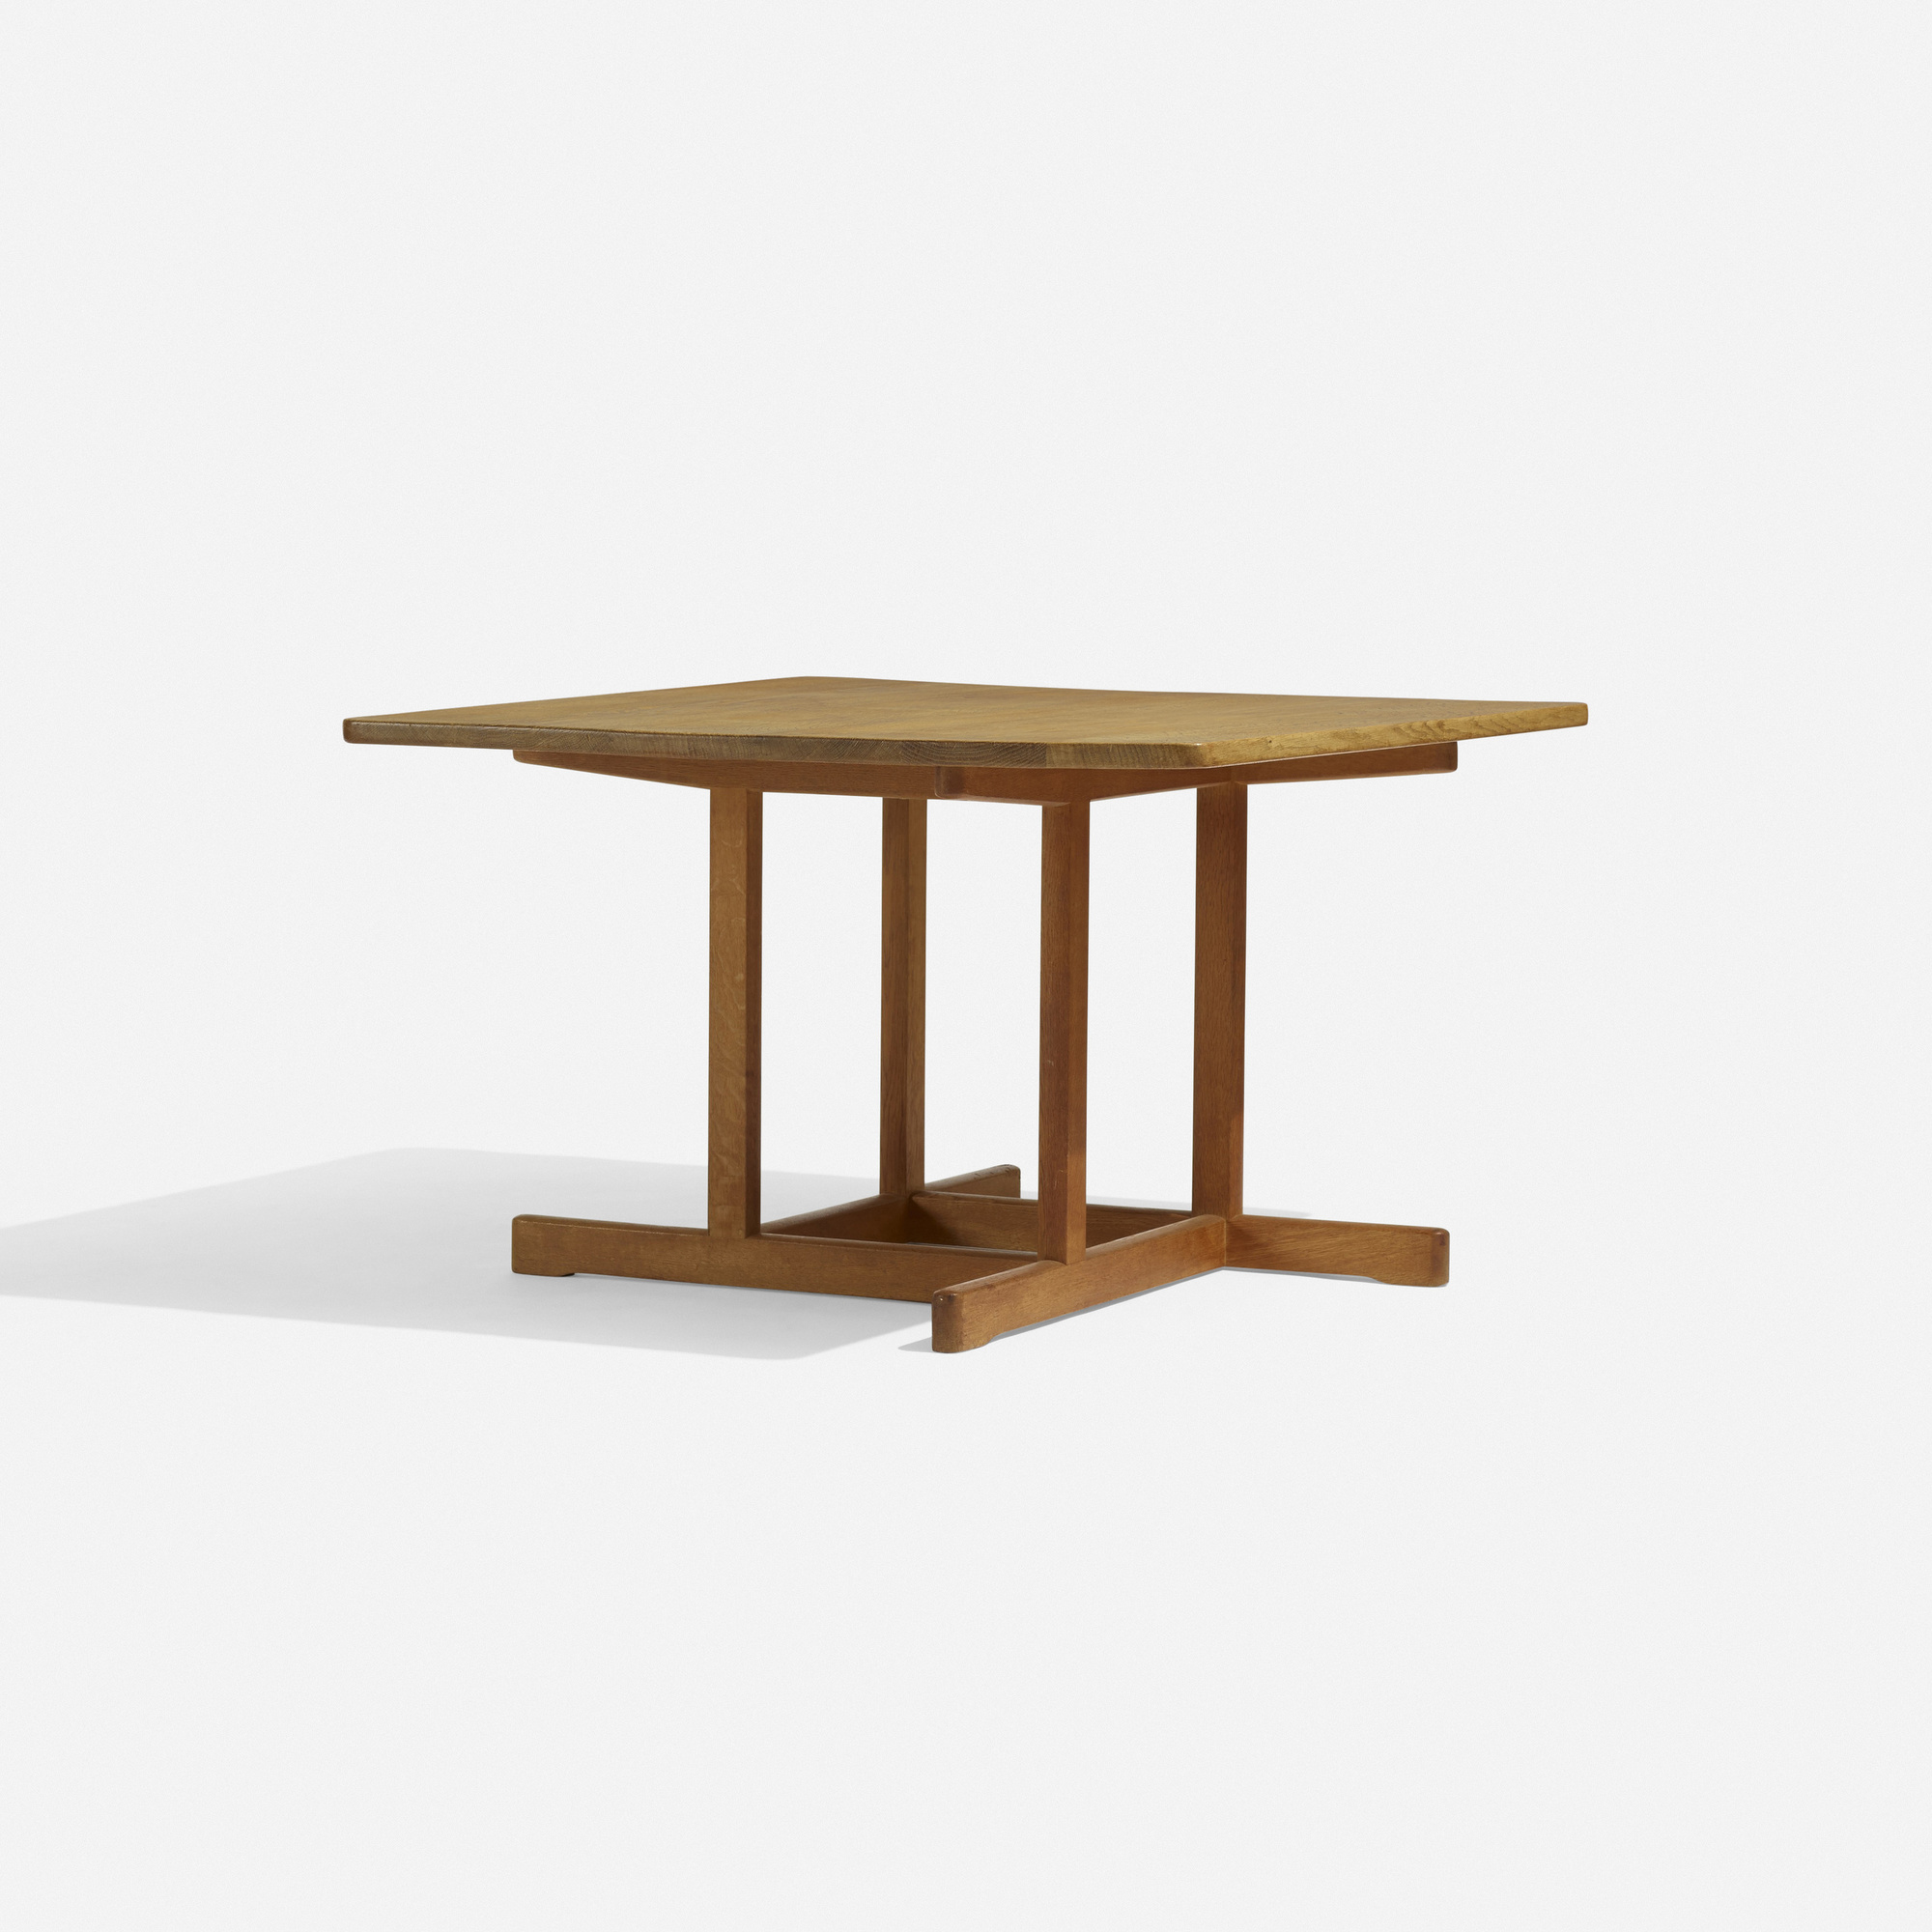 235: Børge Mogensen / coffee table, model 271 (3 of 3)